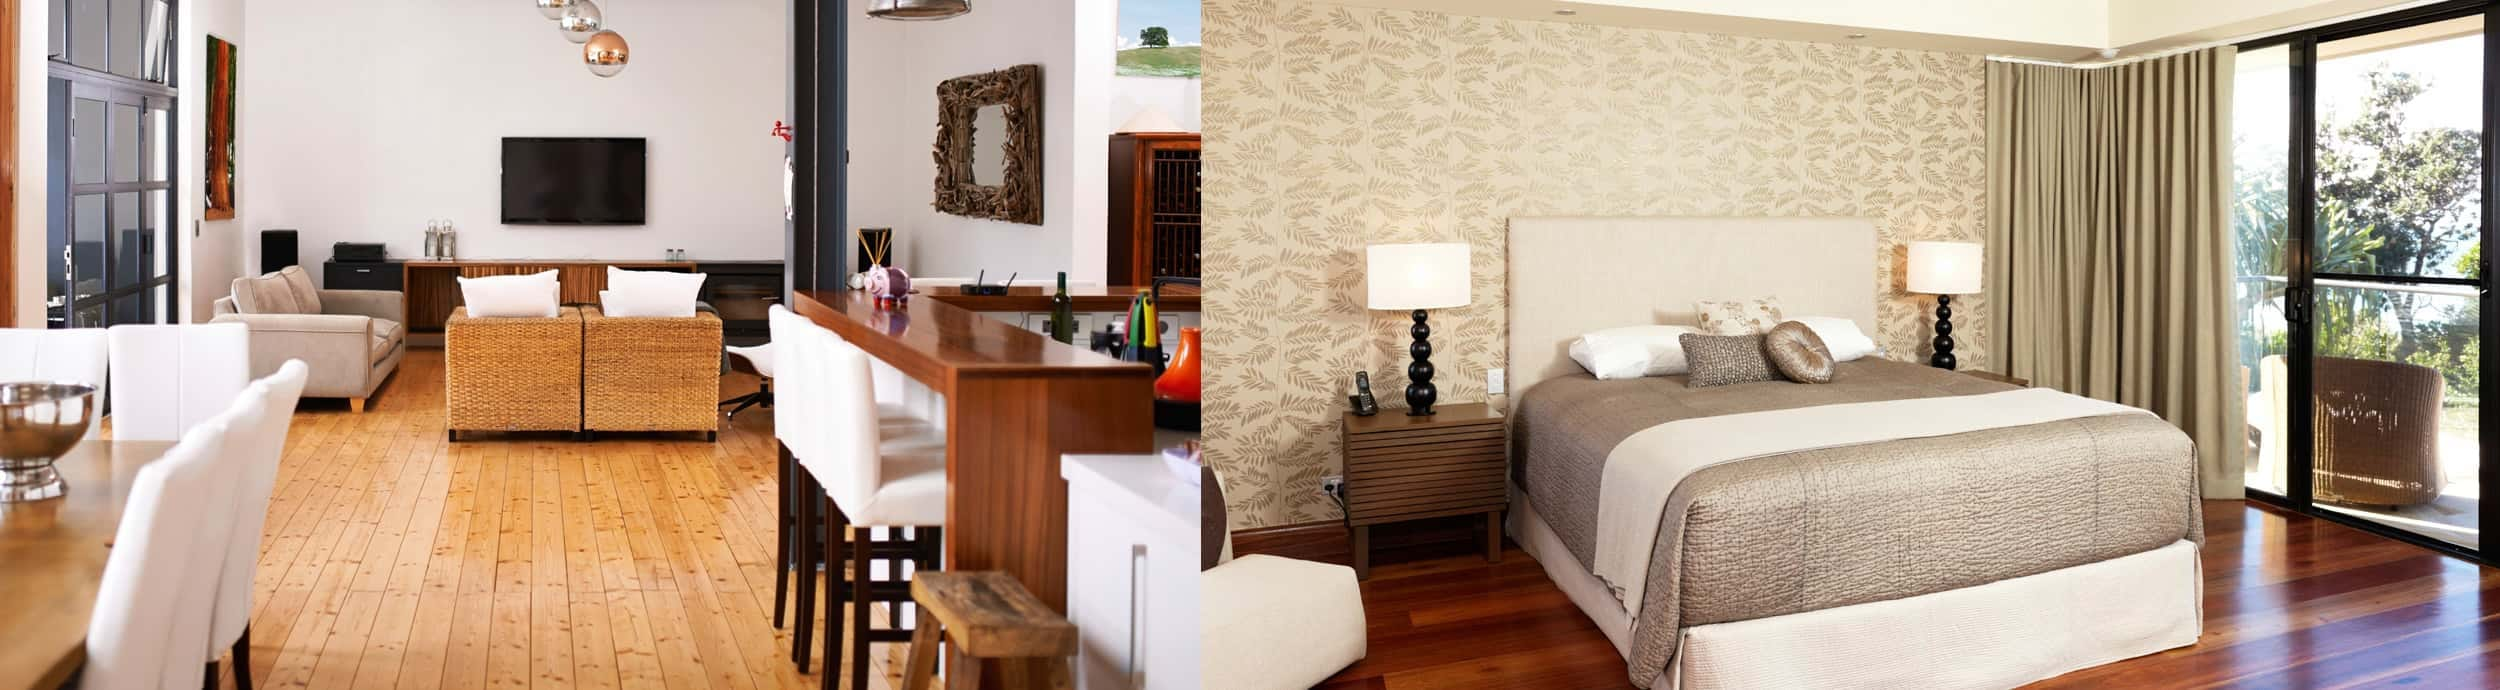 WoodKeeper Melamine Finish for Interior, Wood Finishes Paints